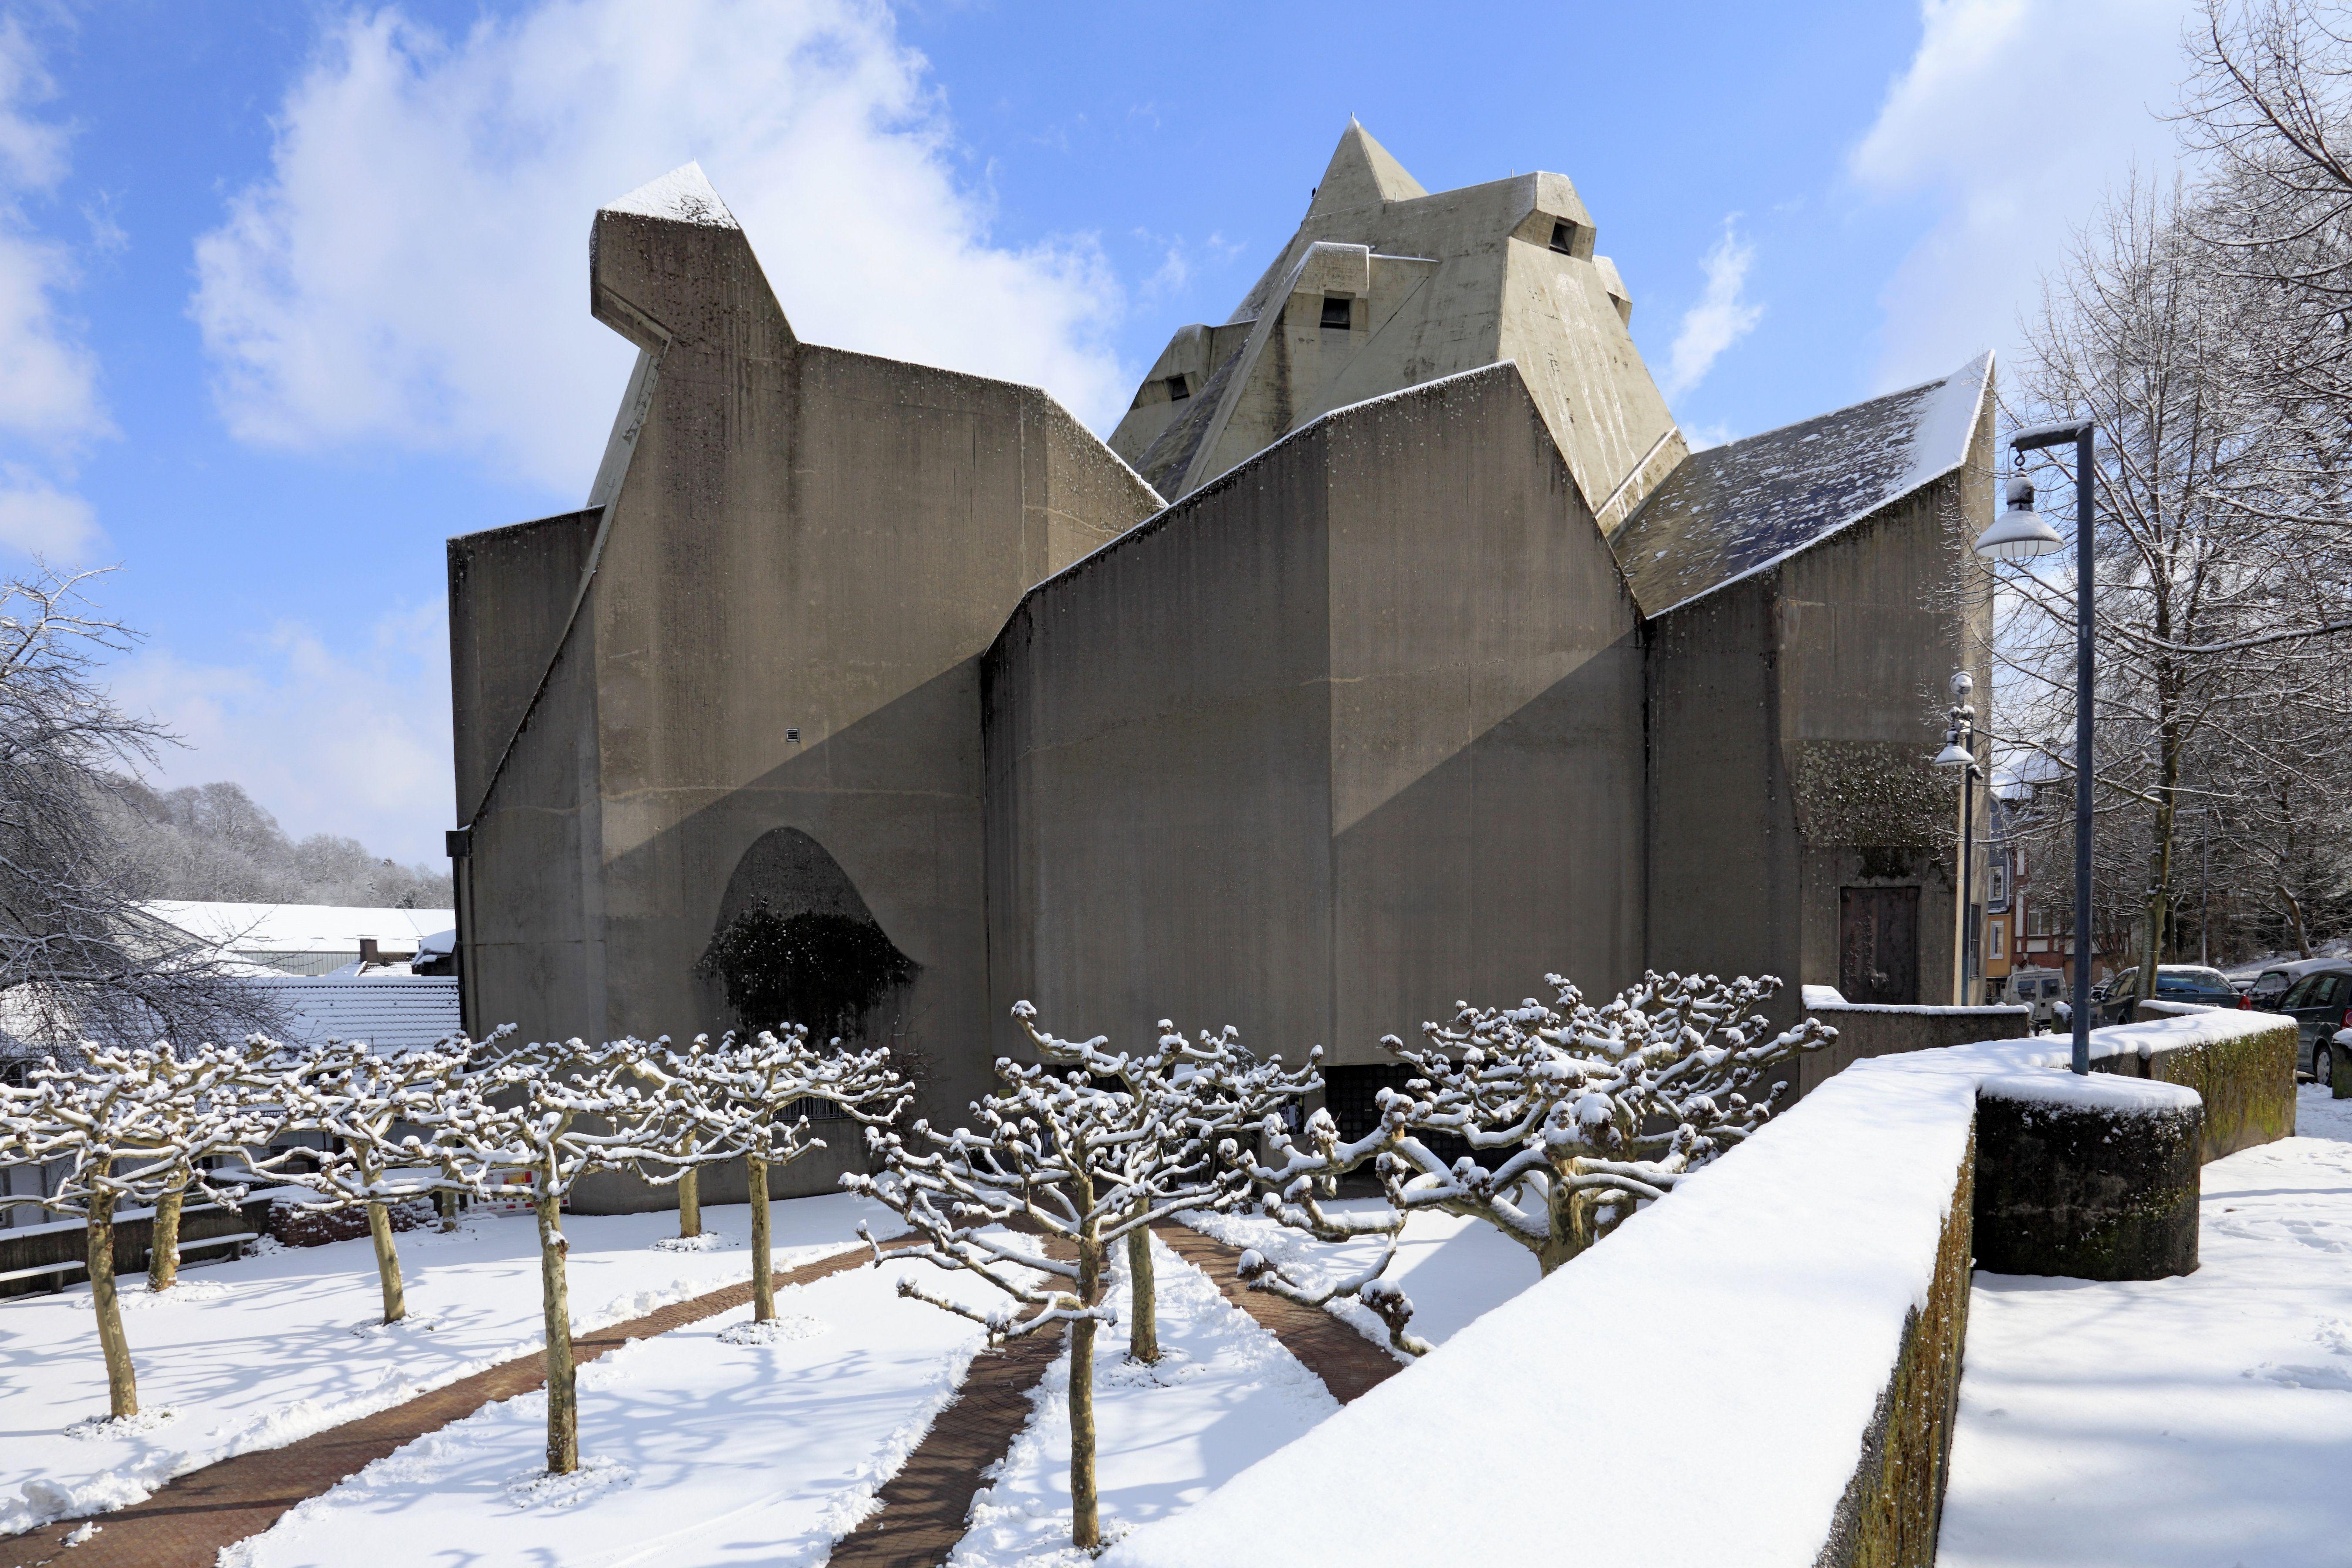 Pilgrimage Cathedral by Pritzker Winner Gottfried Böhm, 1968, Neviges, Germany